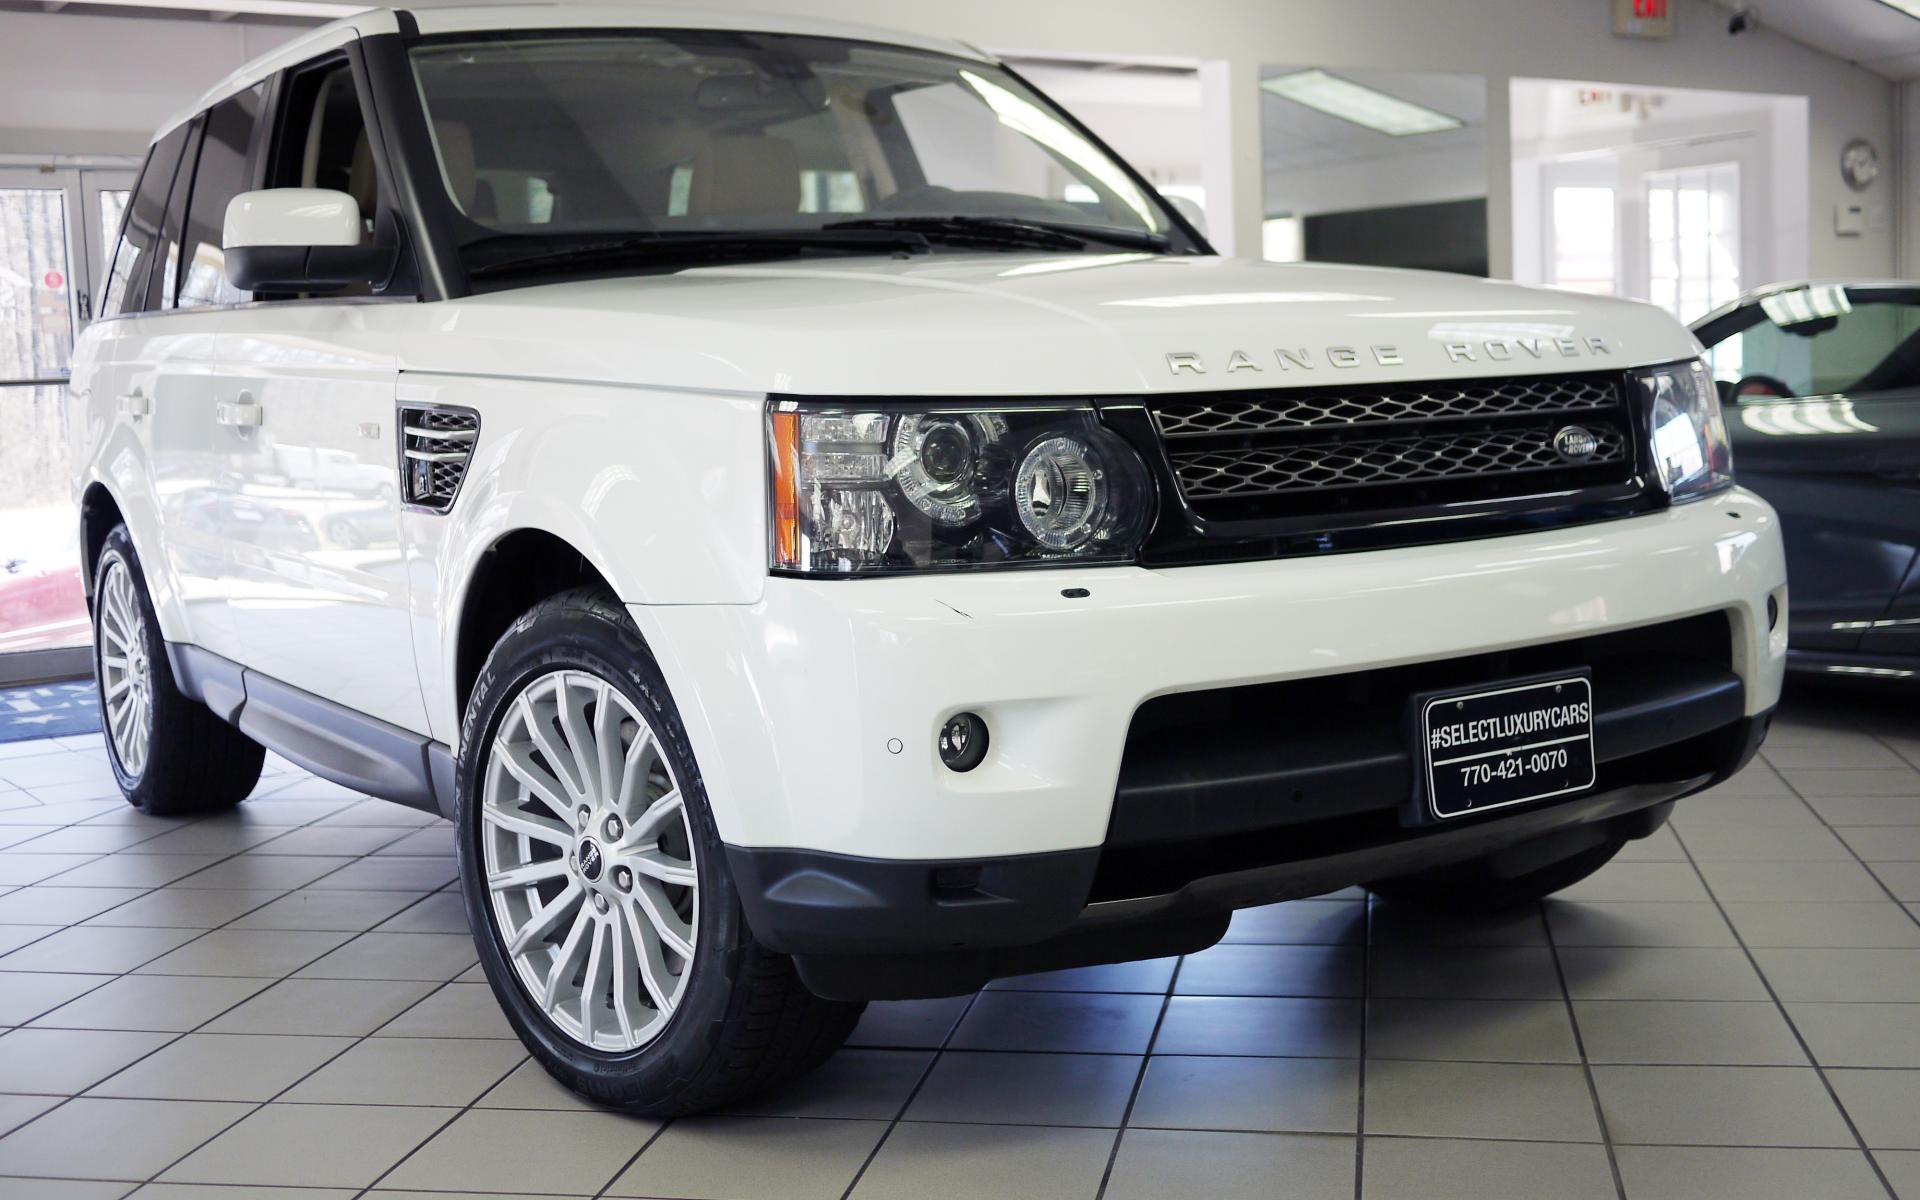 used 2012 land rover range rover sport hse marietta ga. Black Bedroom Furniture Sets. Home Design Ideas